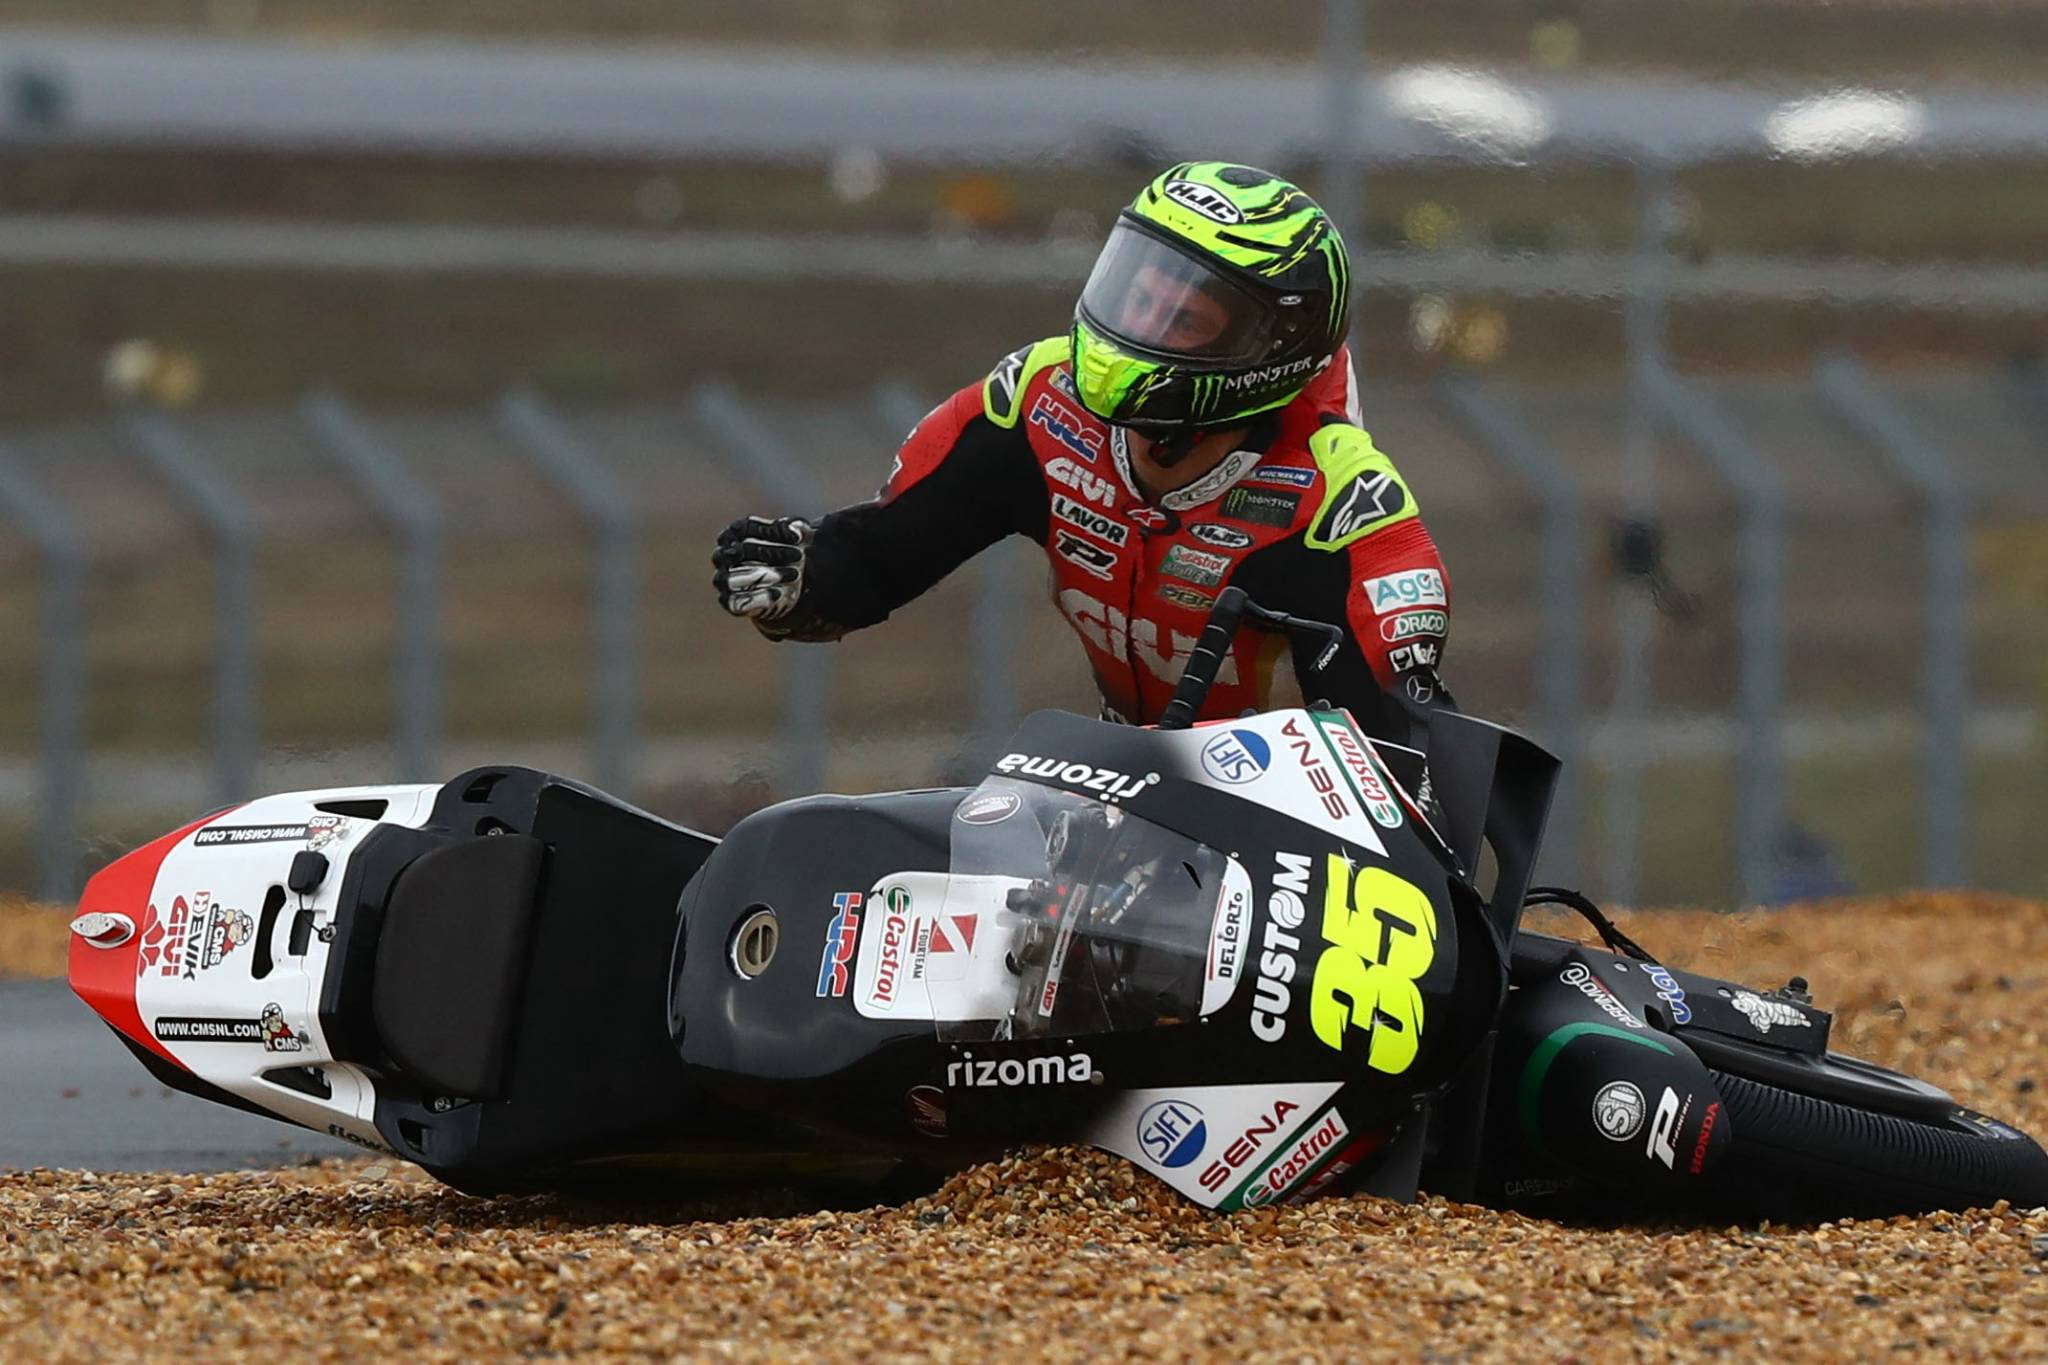 Cal Crutchlow after crash , MotoGP race, French MotoGP. 11 October 2020